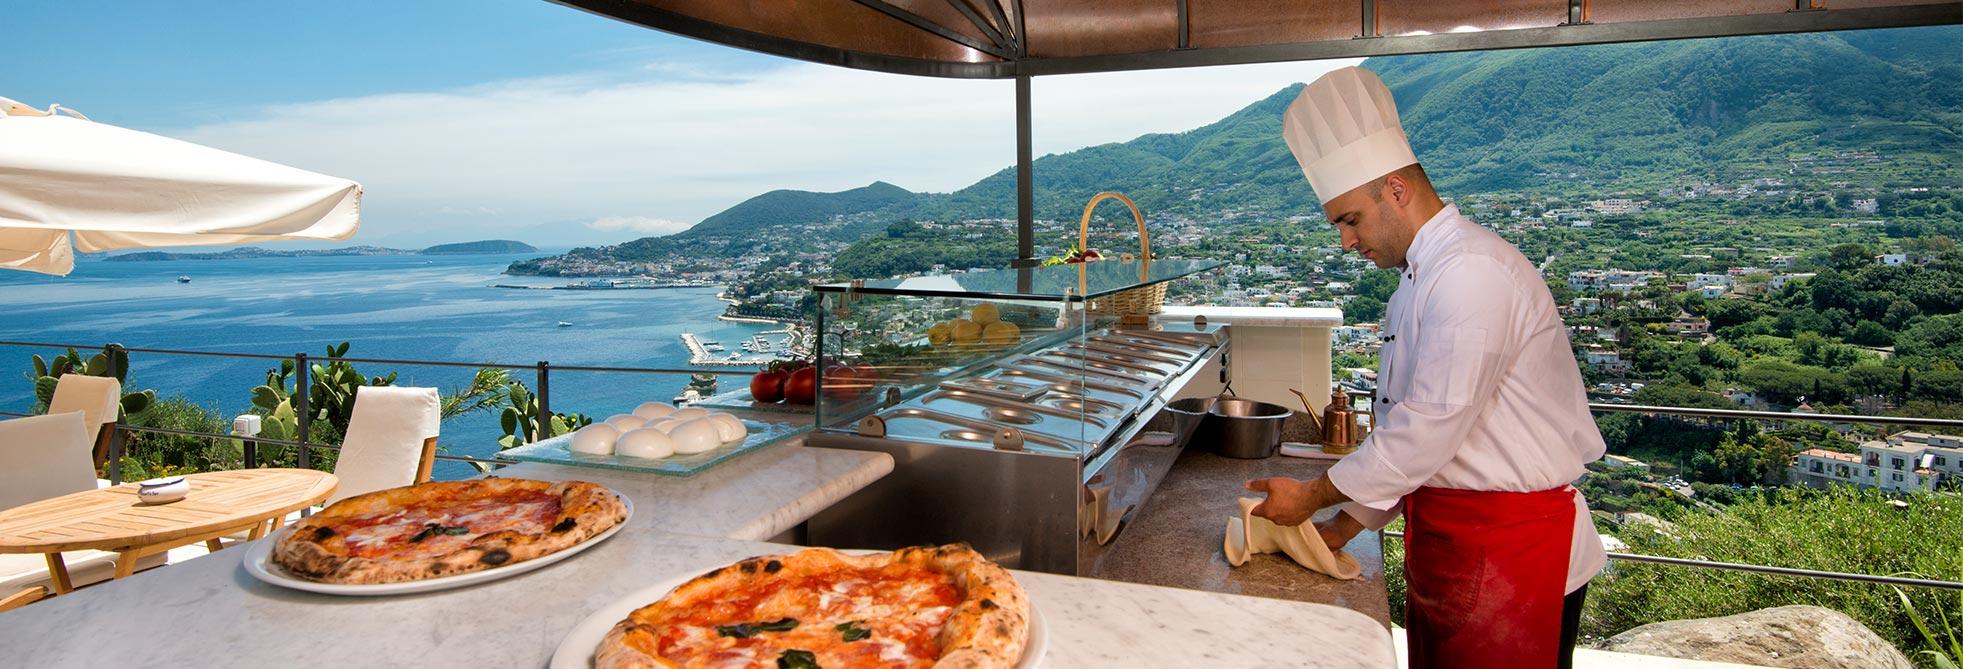 chef-making-pizza-at-san-montano-acropoli--restaurant